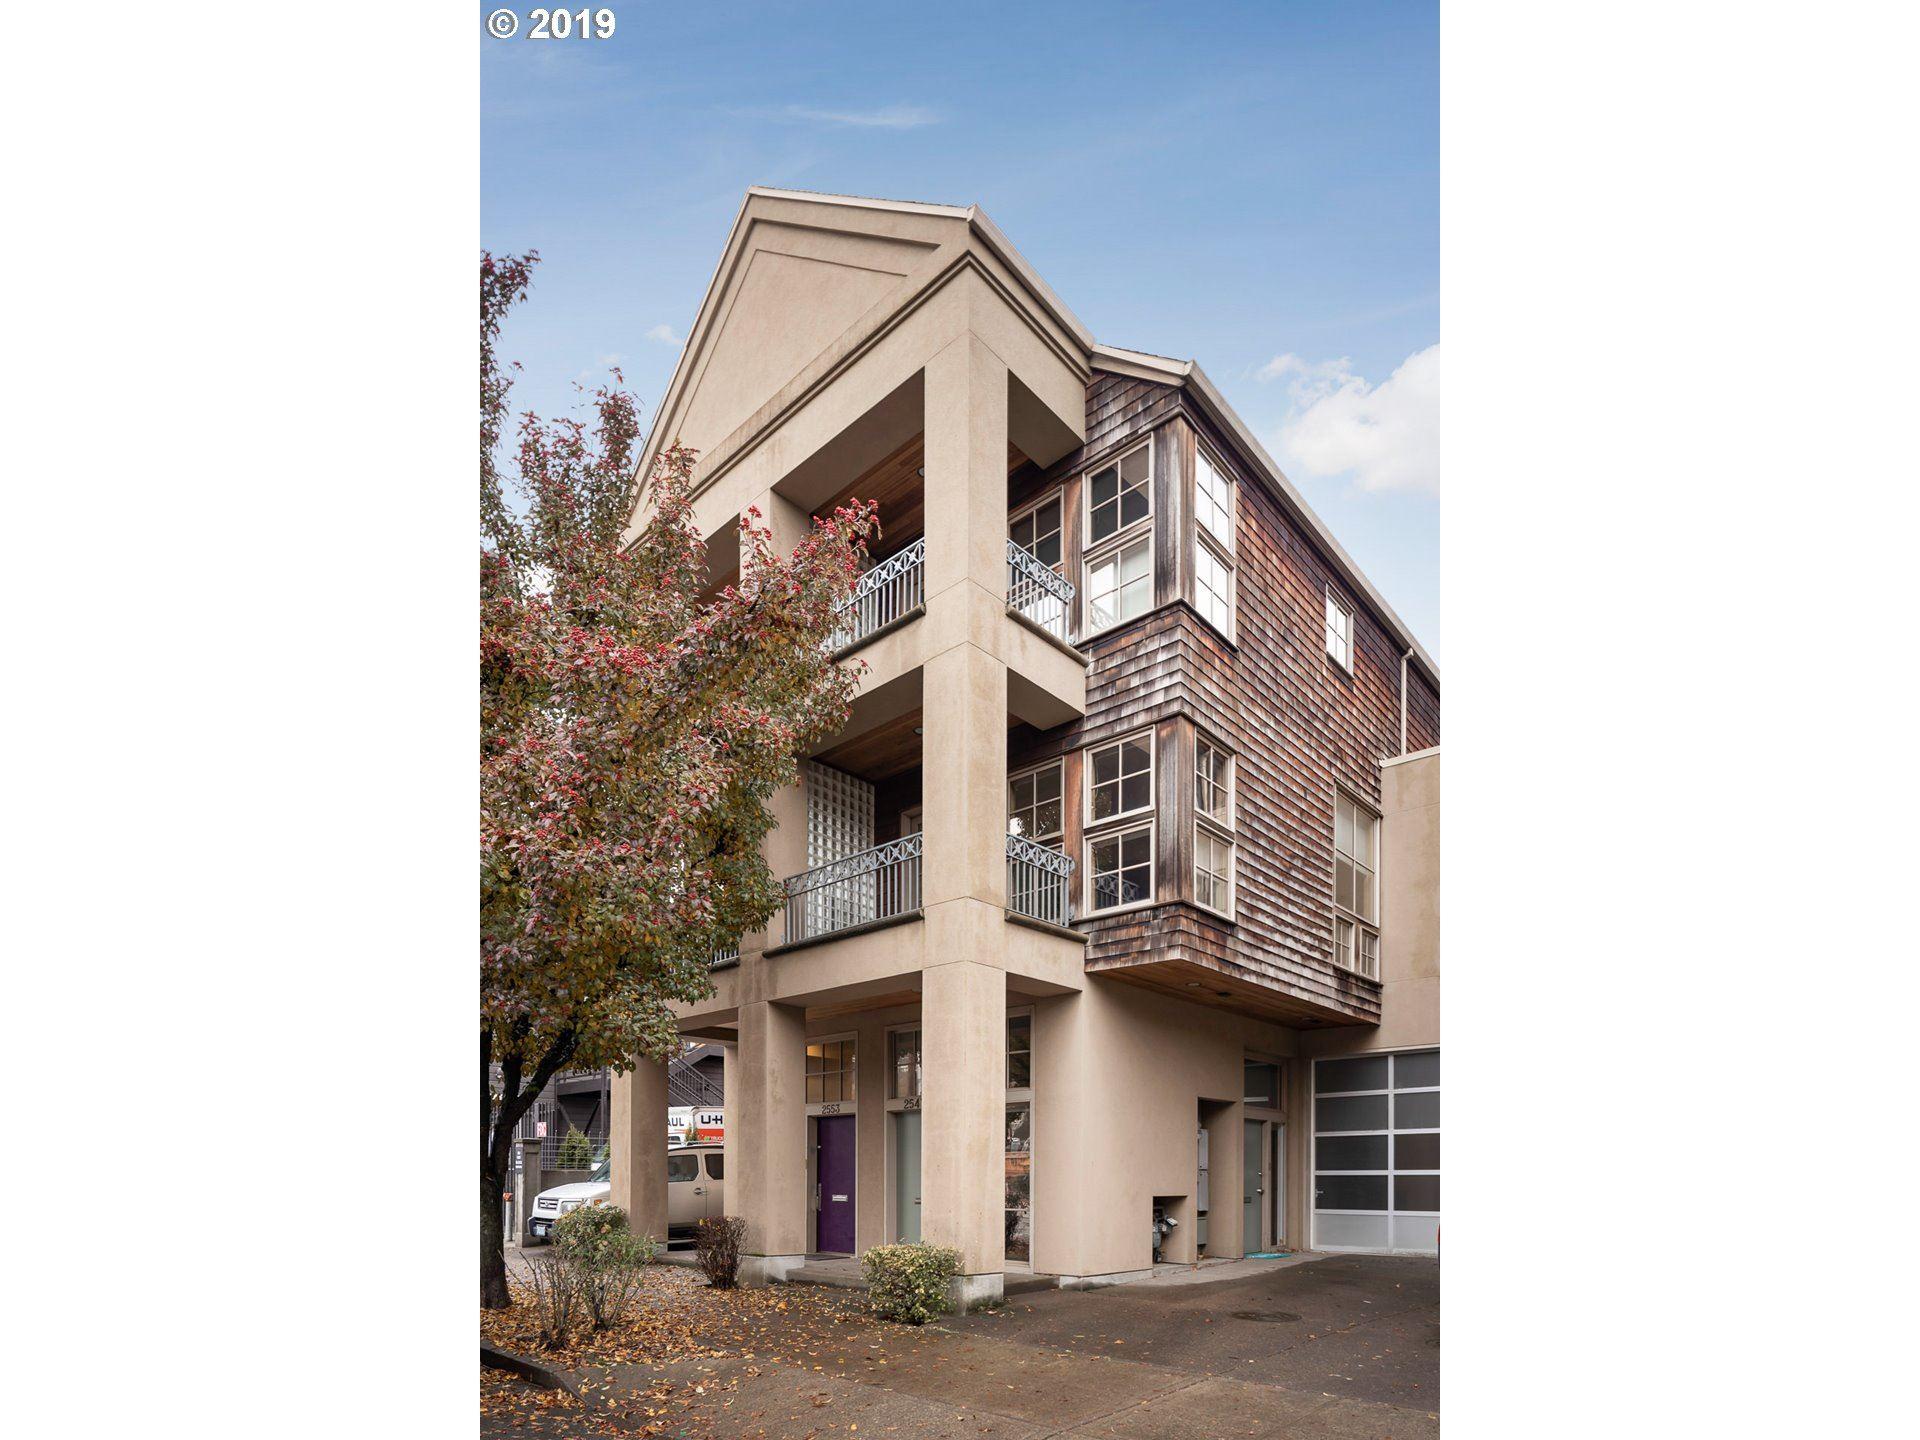 2547 NW UPSHUR ST, Portland, OR 97210 - MLS#: 19696873